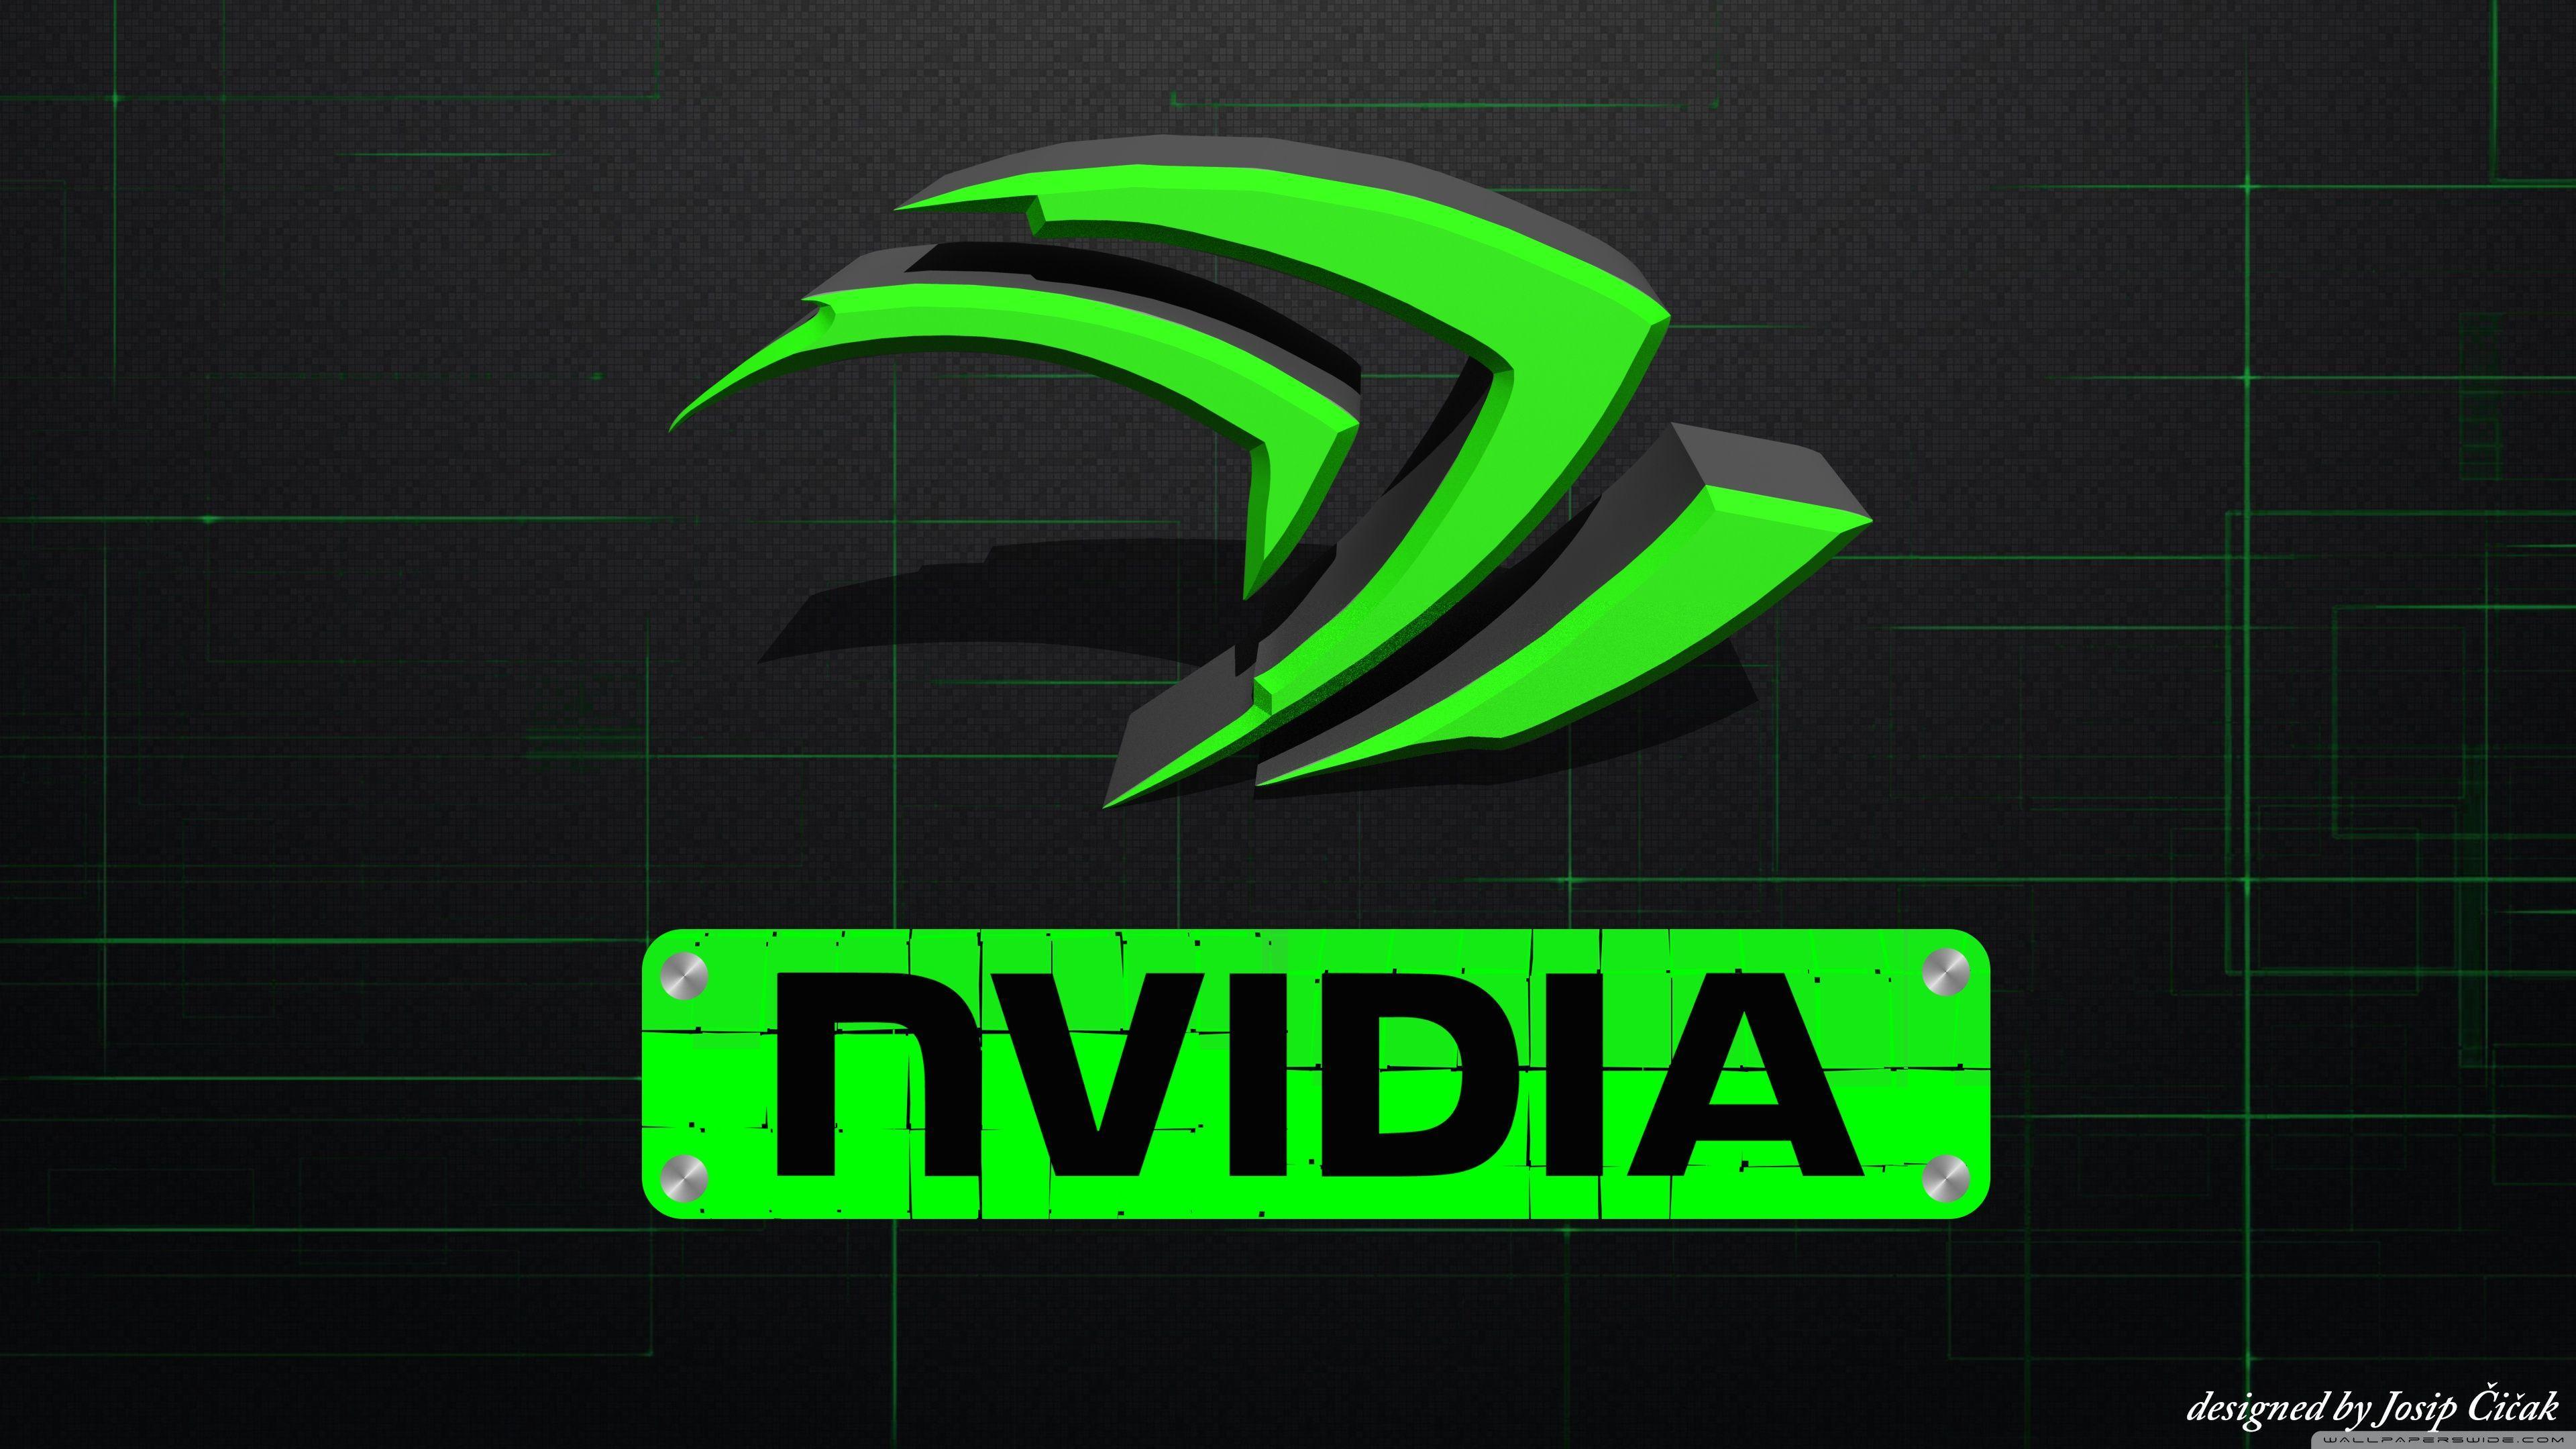 Nvidia 4k Desktop Wallpapers Top Free Nvidia 4k Desktop